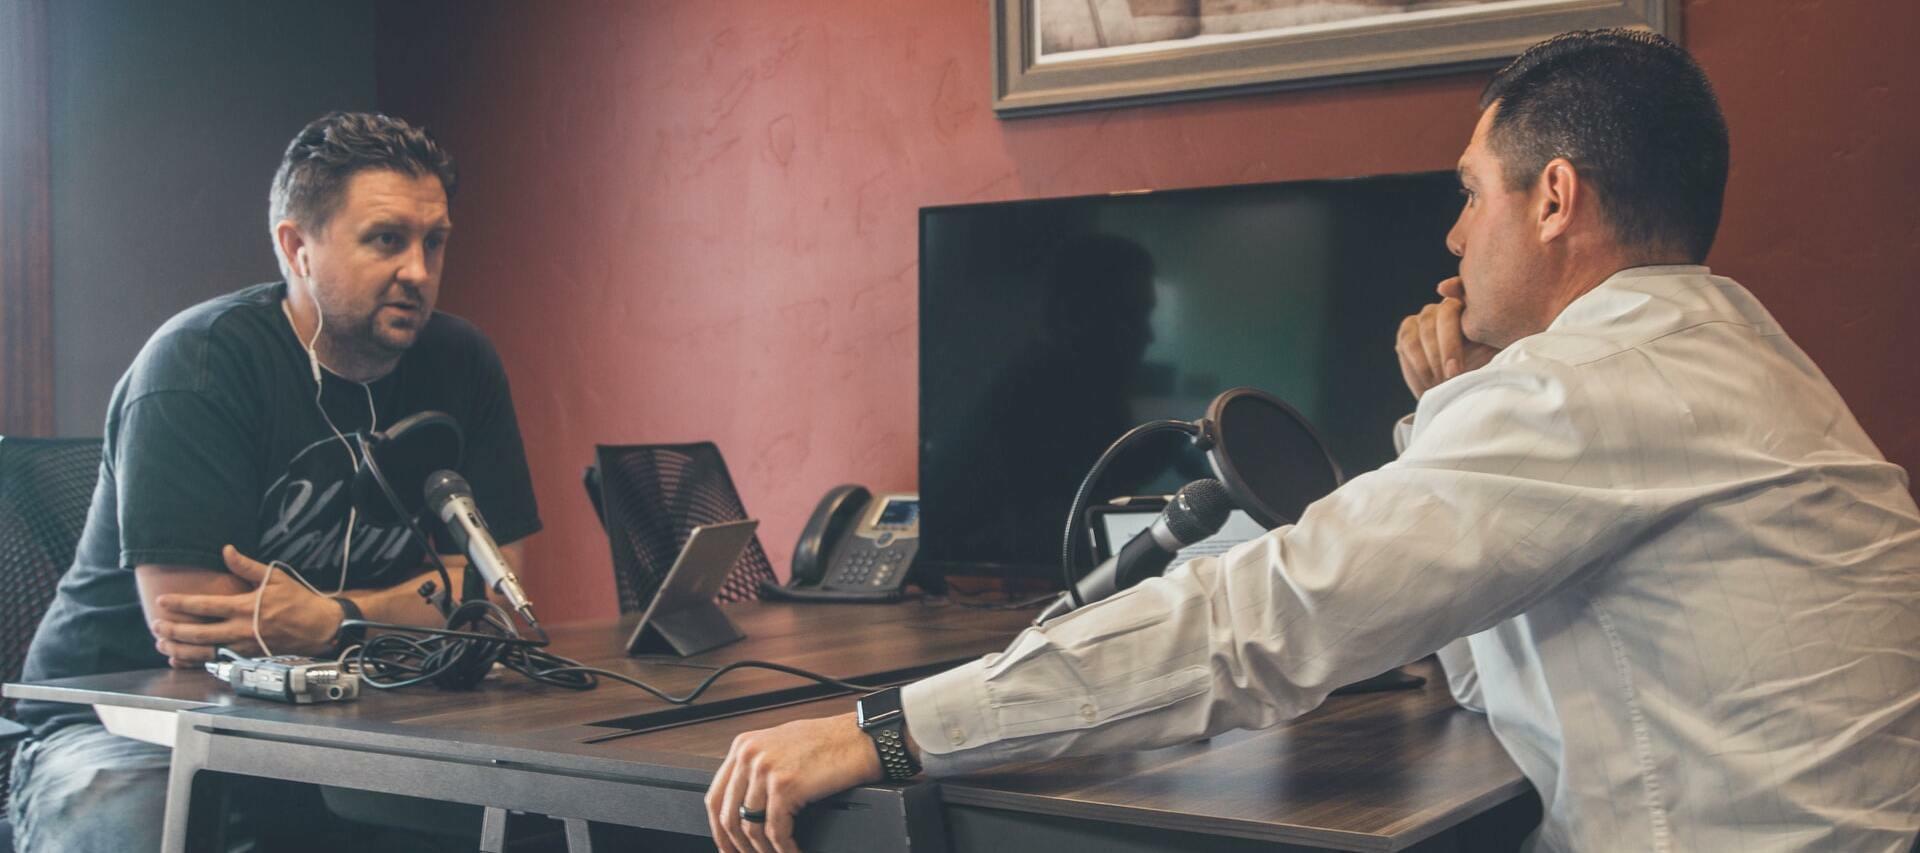 Nutanix Community Podcast - Becoming Cloud Smart